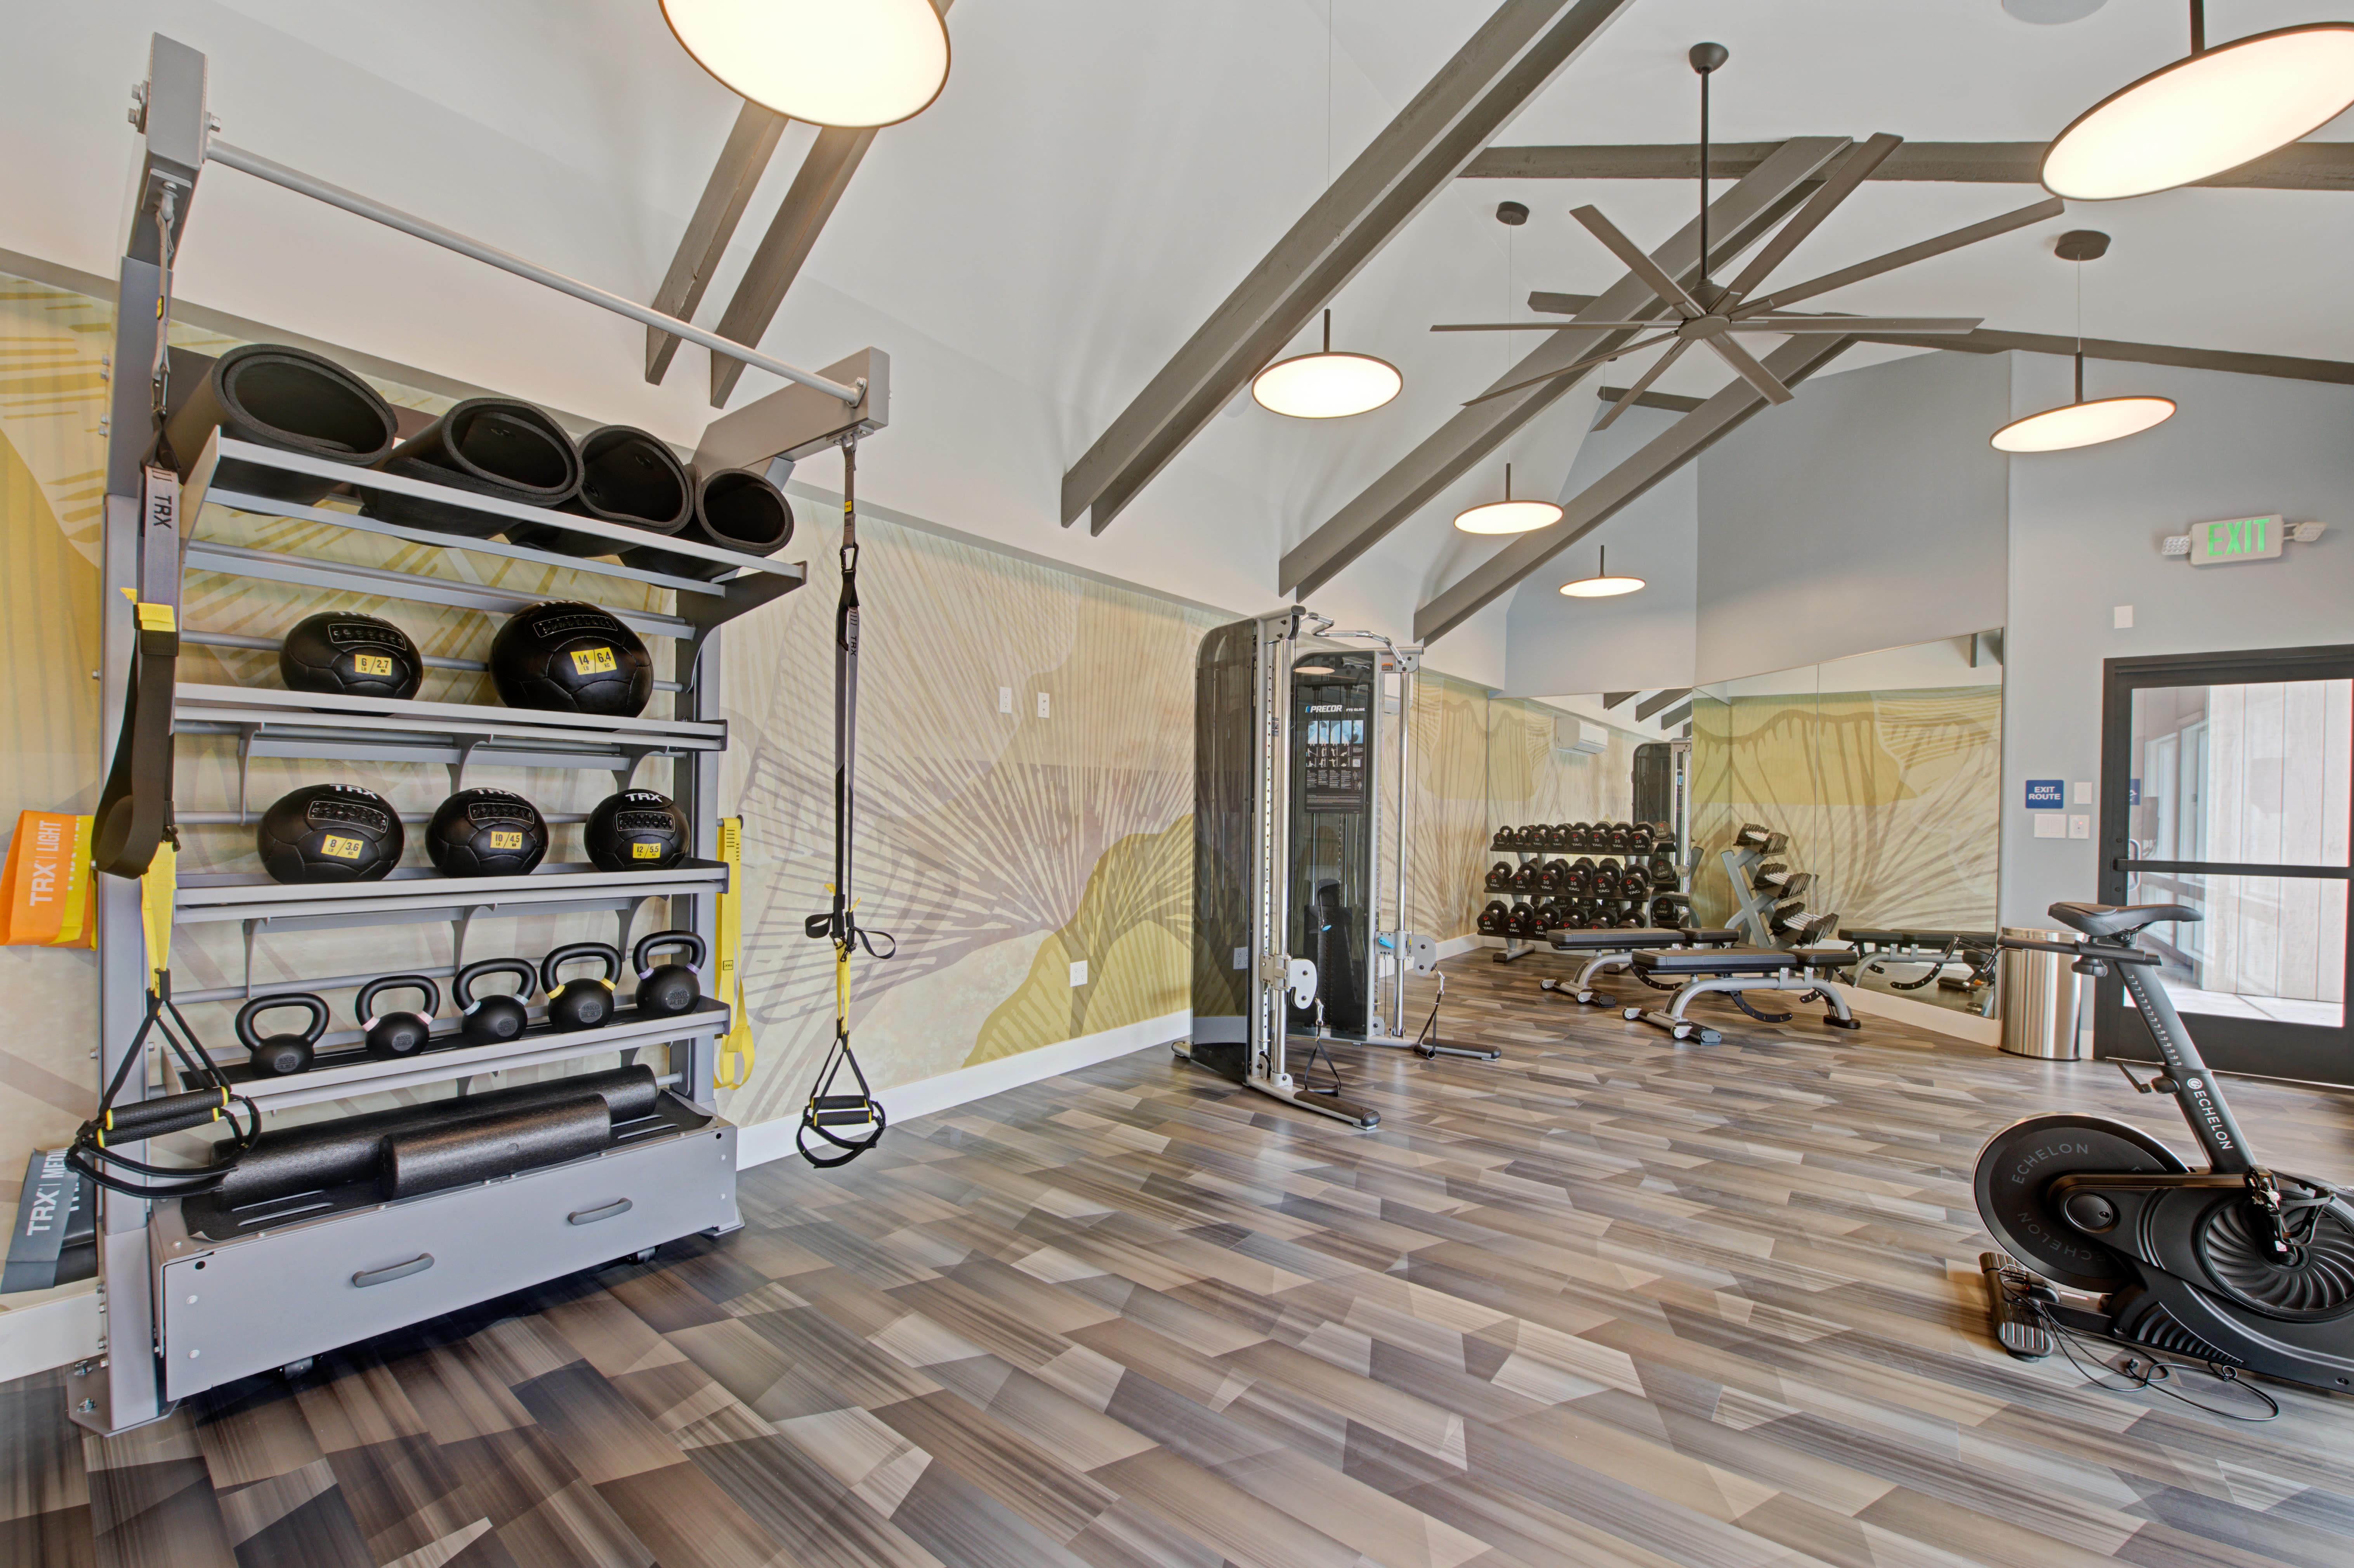 Fitness center and weights at Sofi Ventura in Ventura, California